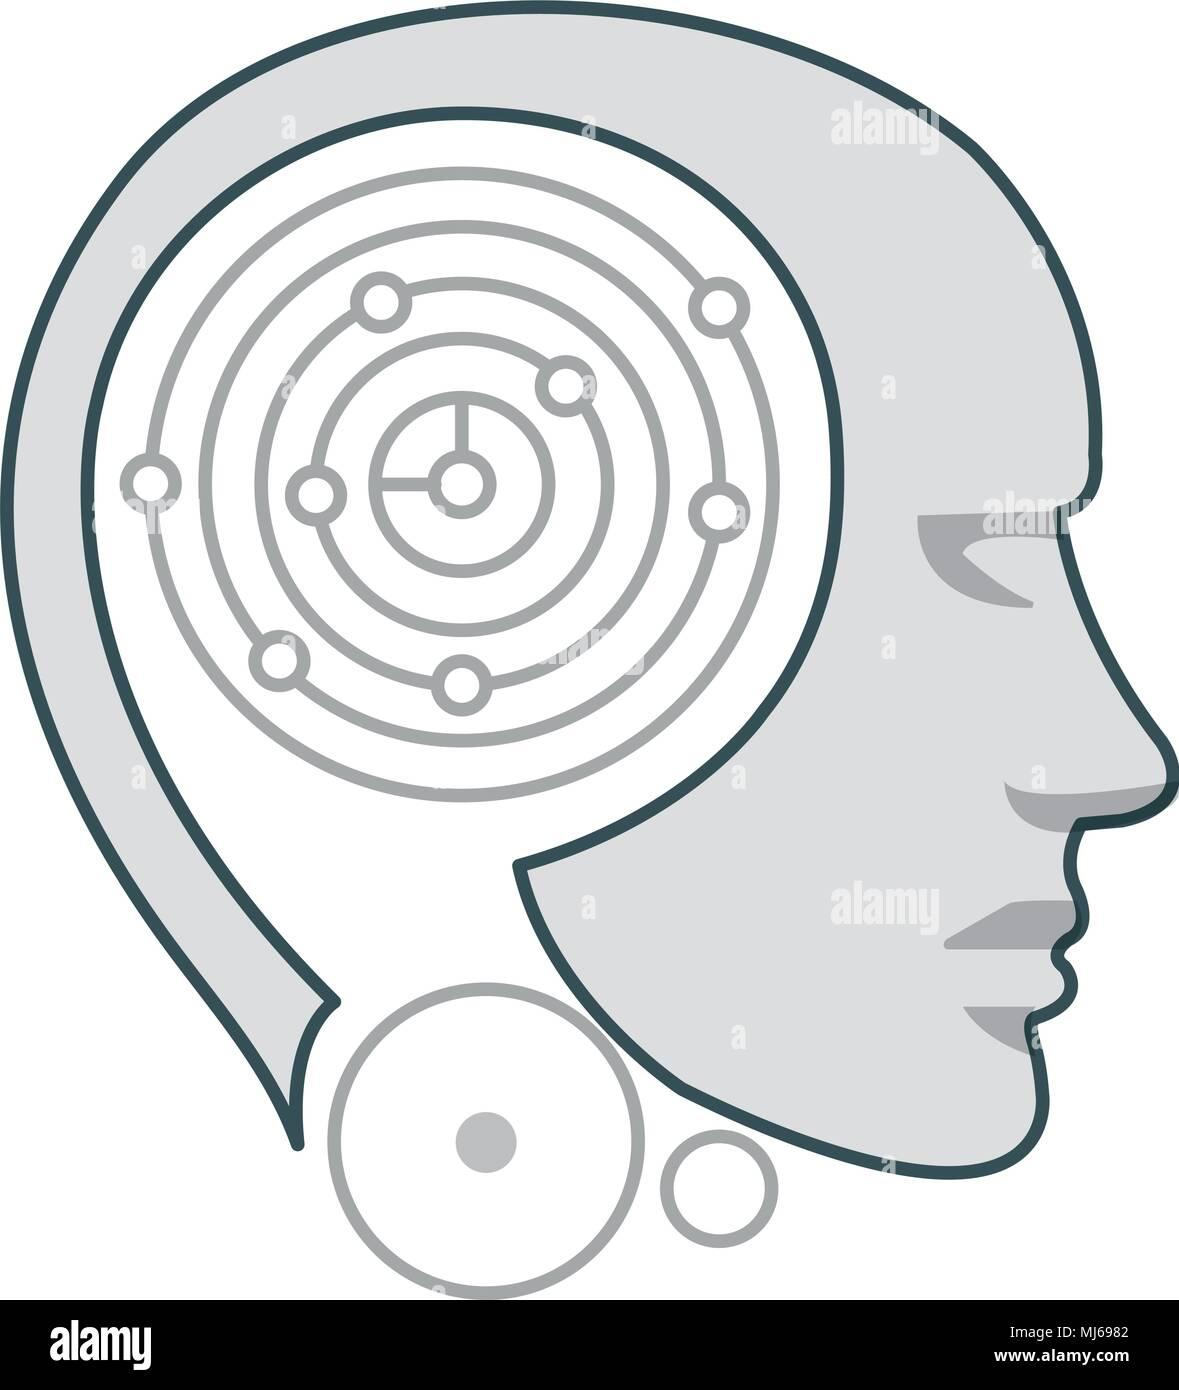 robot humanoid profile icon - Stock Image